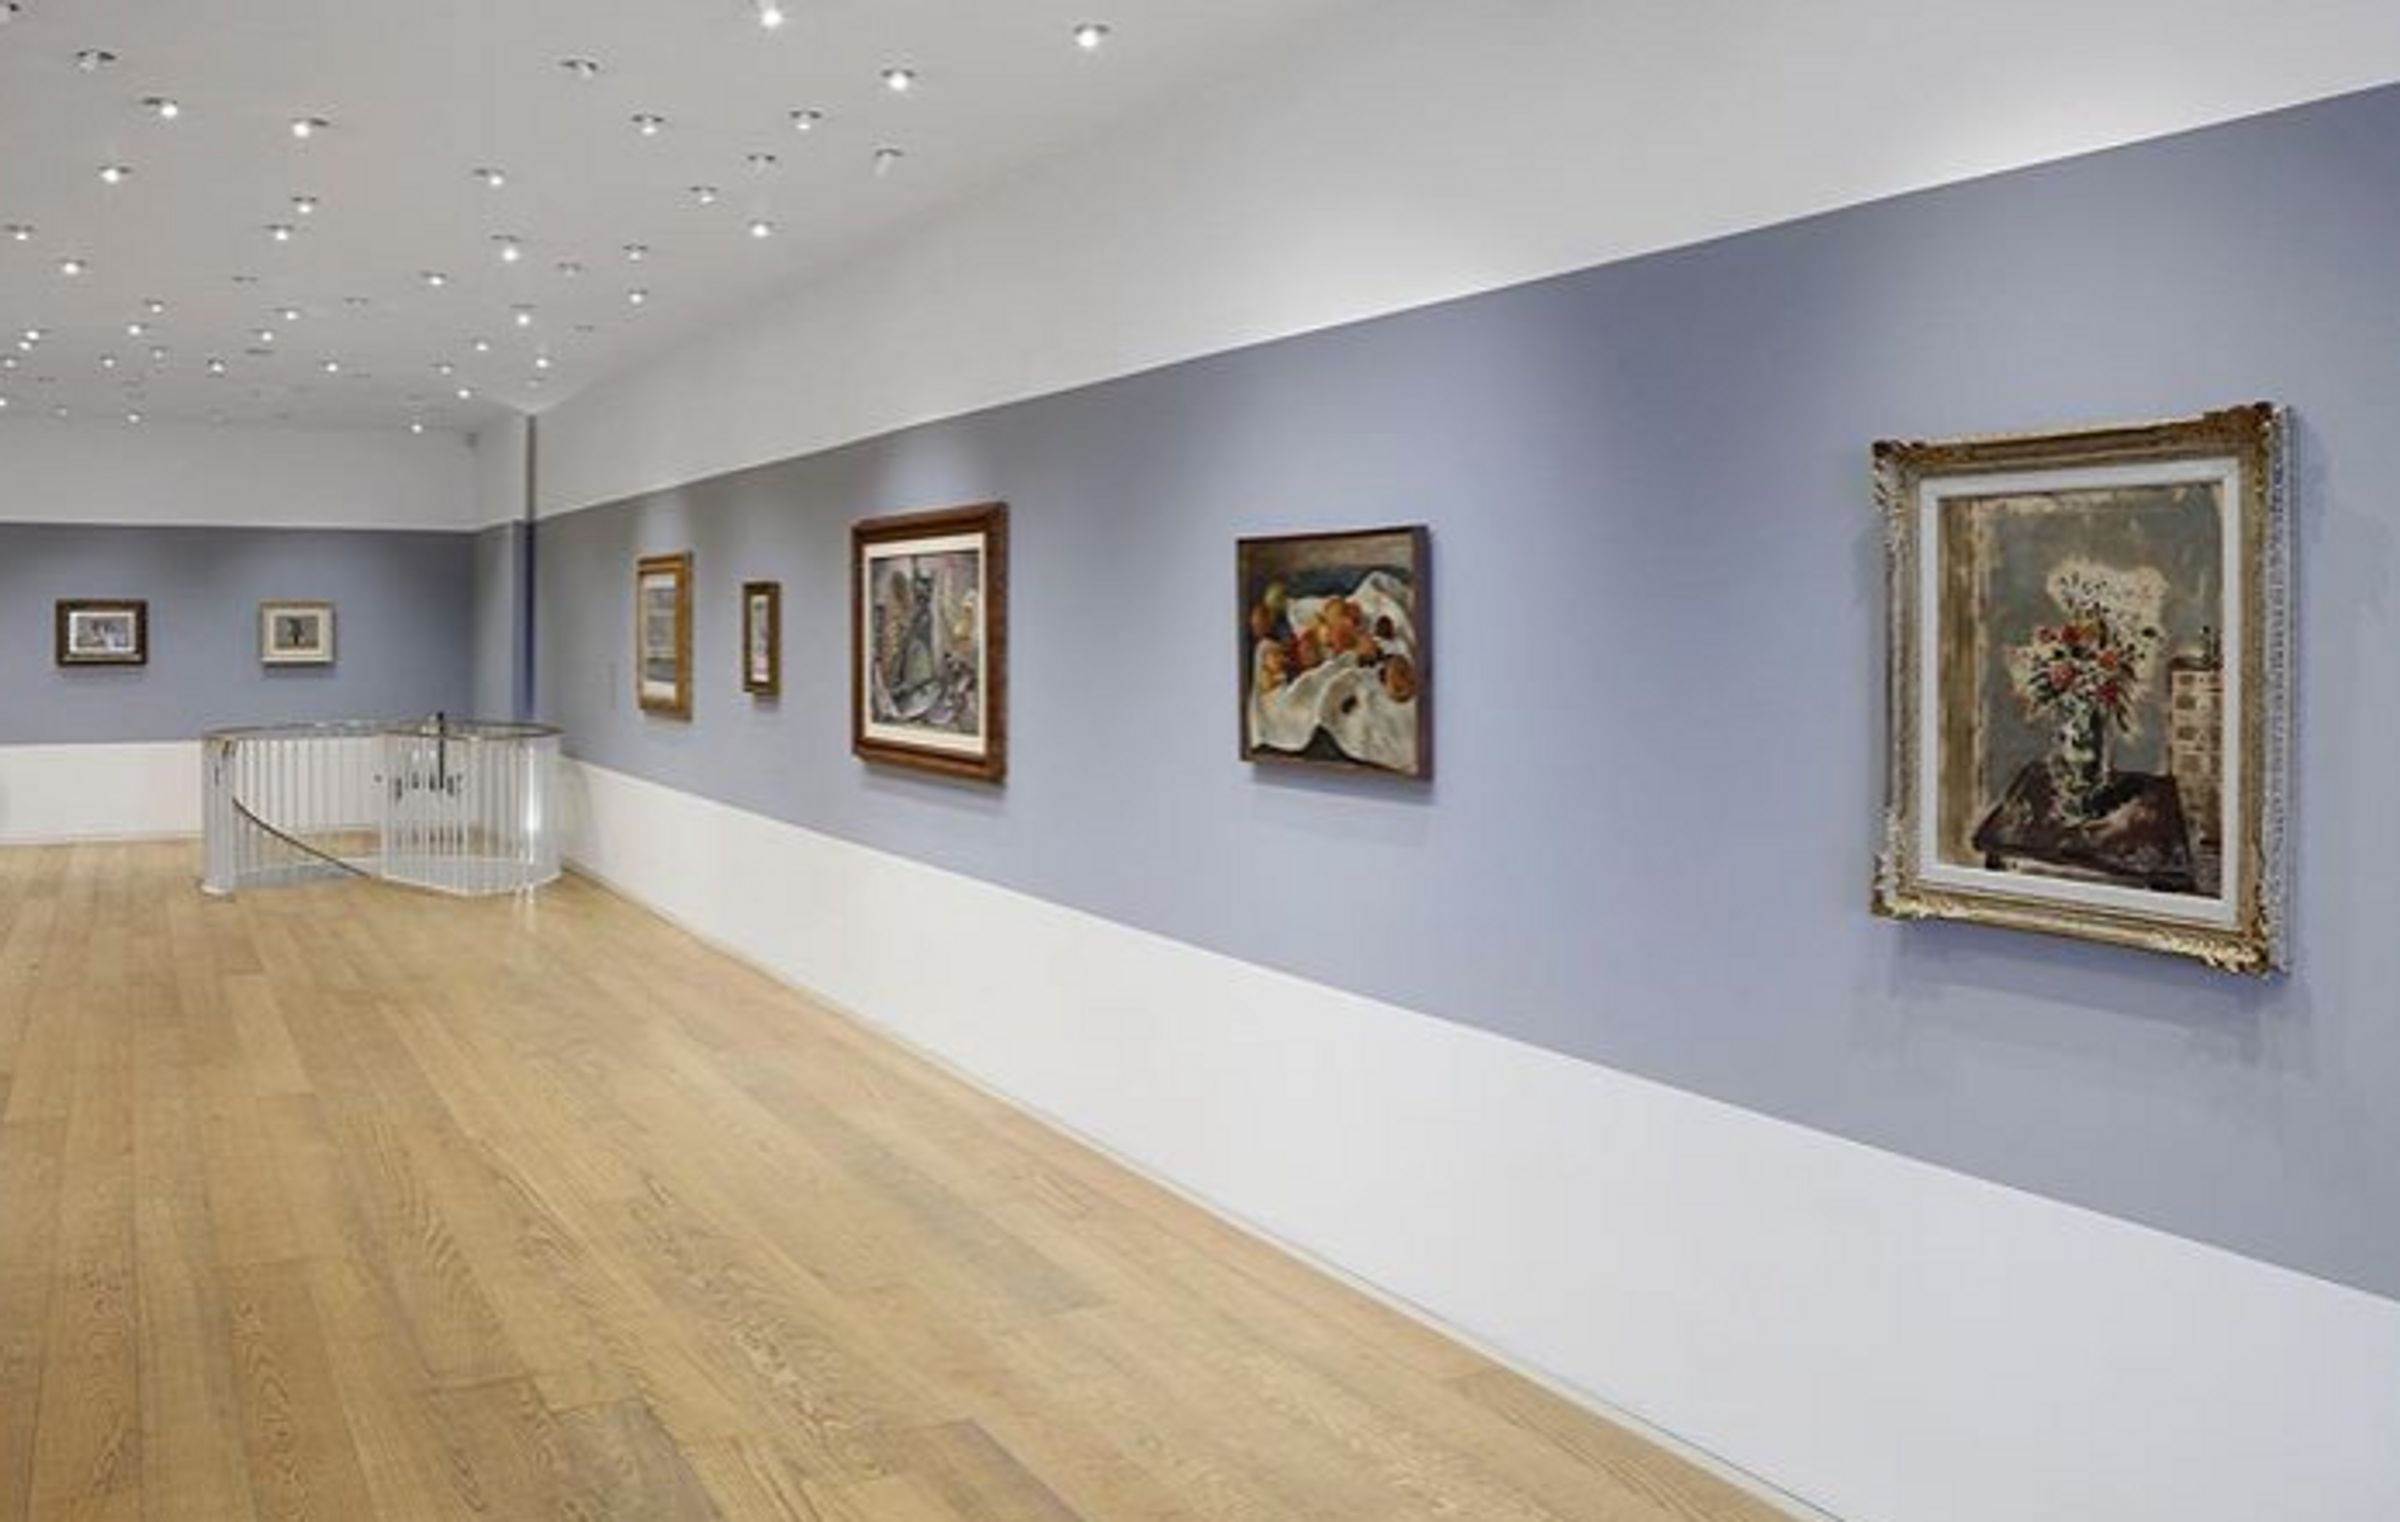 Morandi, Balla, de Chirico and Italian Painting 1920 - 1950